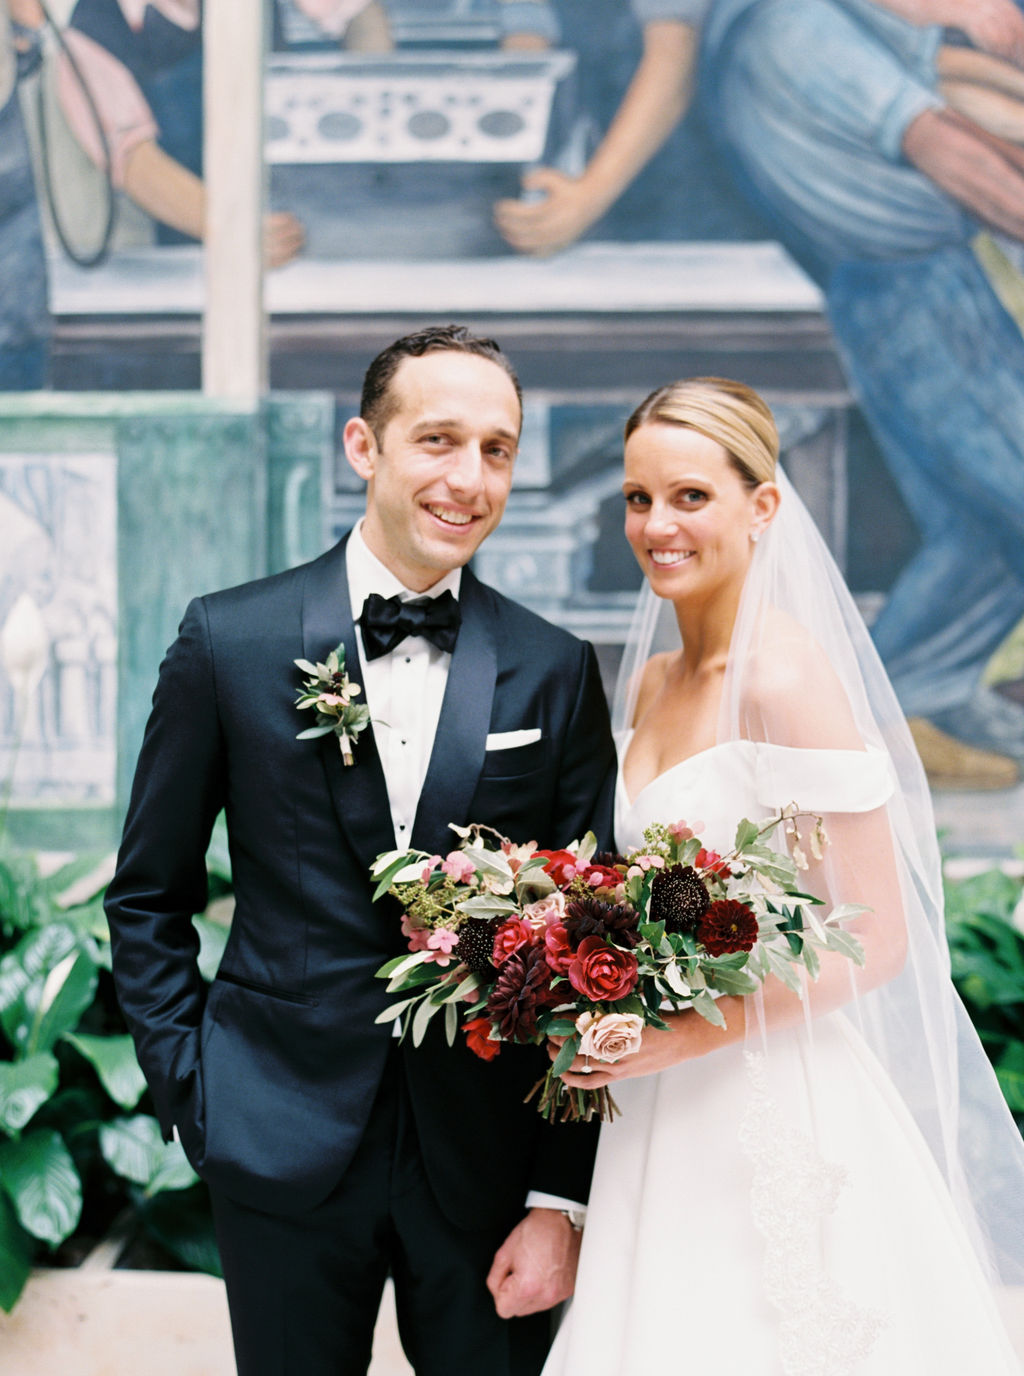 Kyle-Menna-Wedding-krmorenophoto-389.jpg